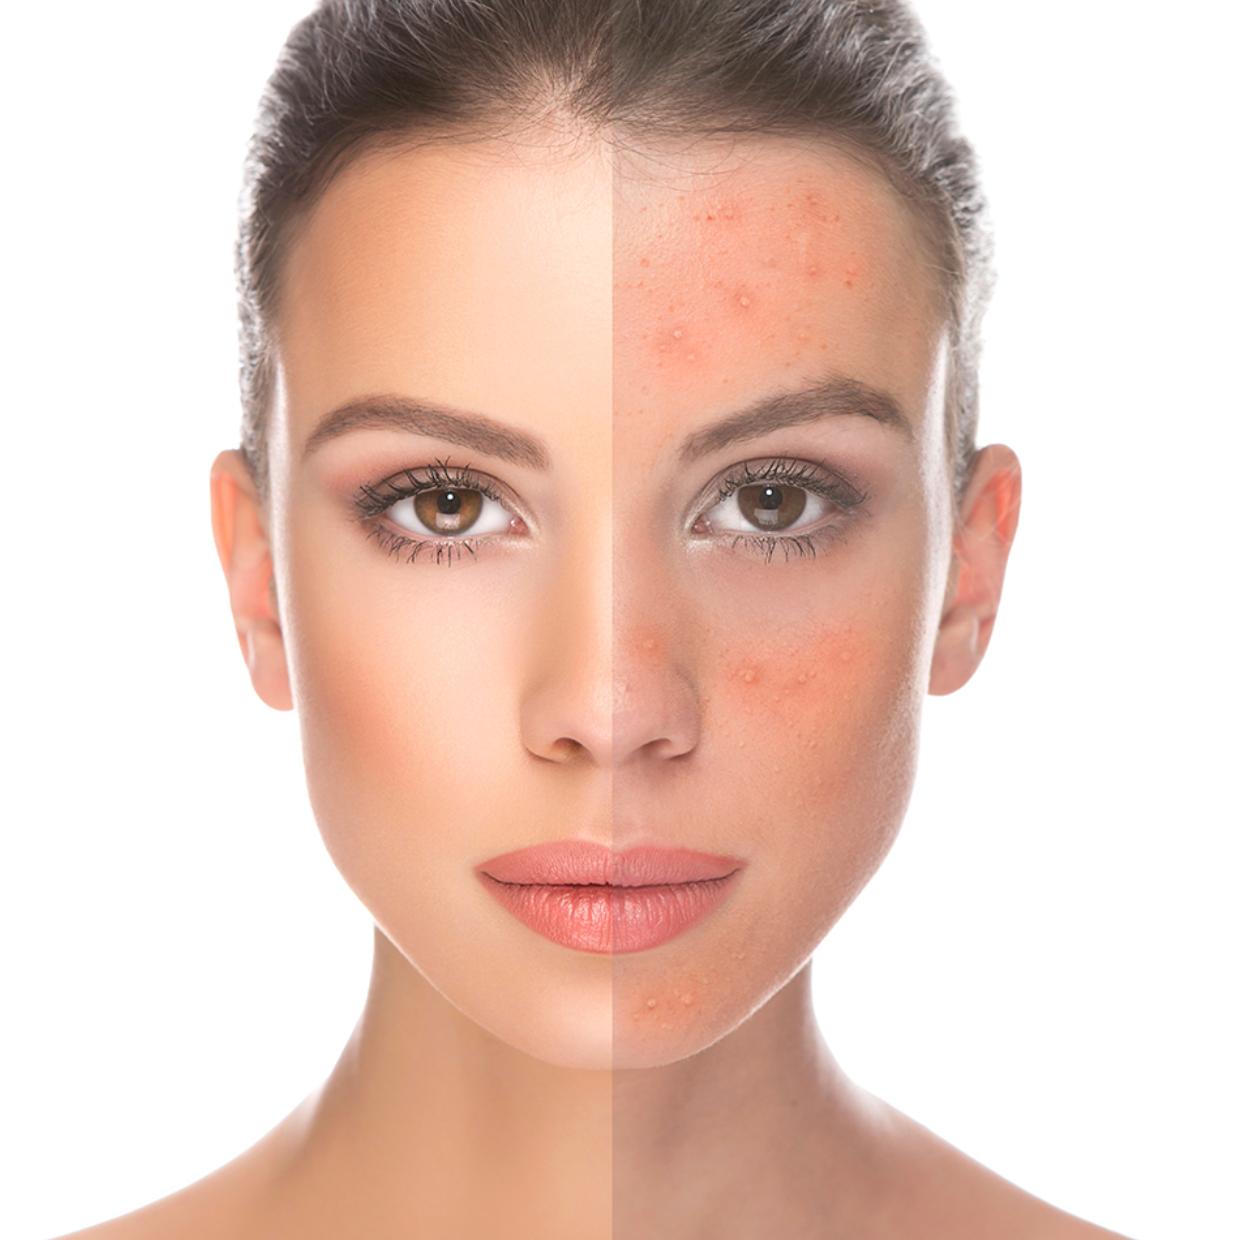 Beta Peel for Acne